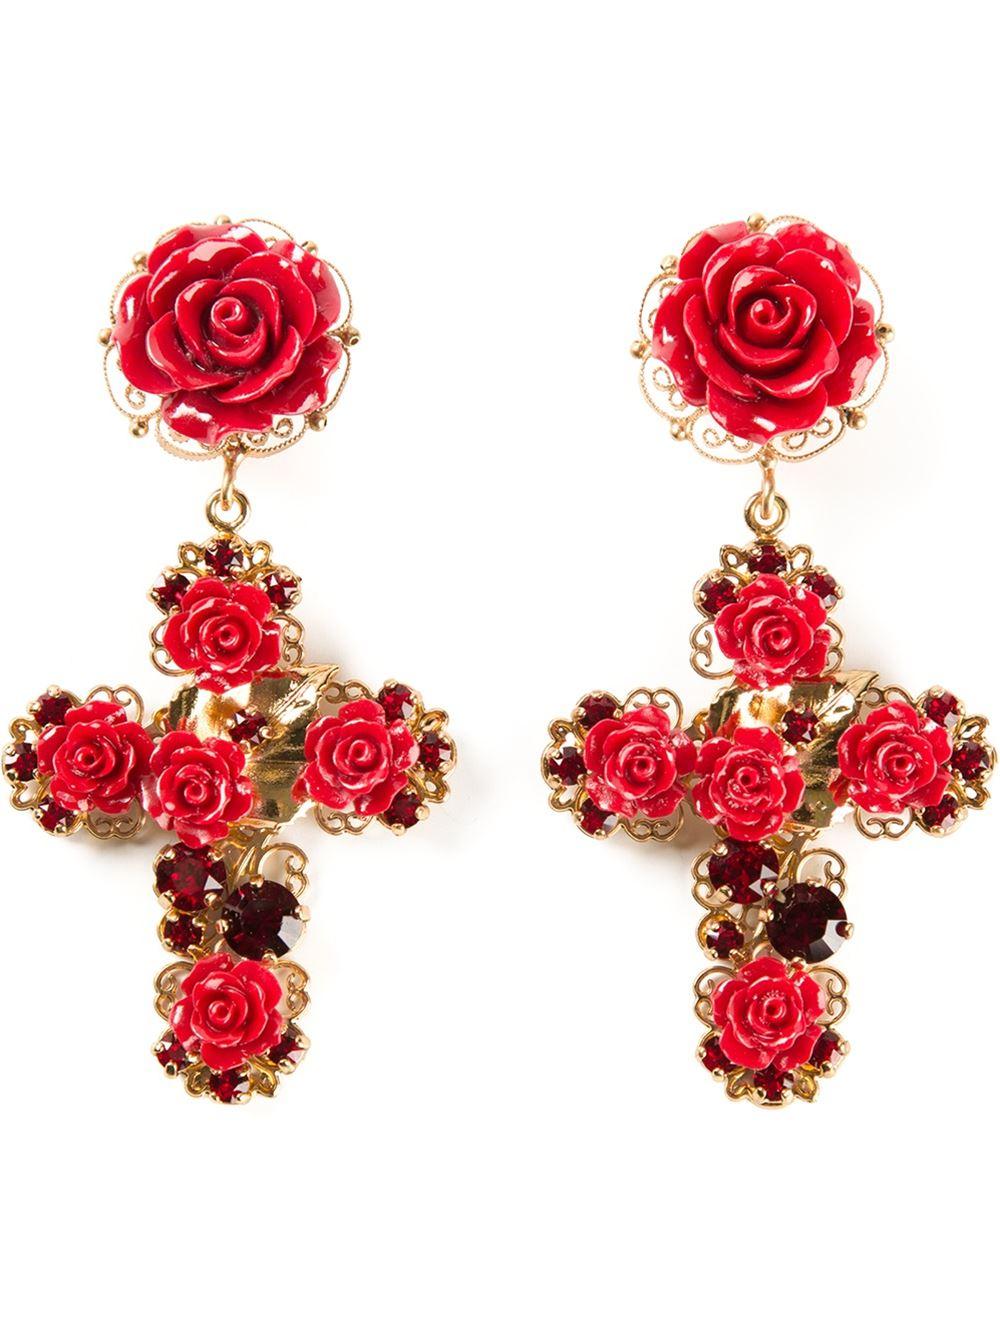 crystal rose drop earrings - Red Dolce & Gabbana G30kC